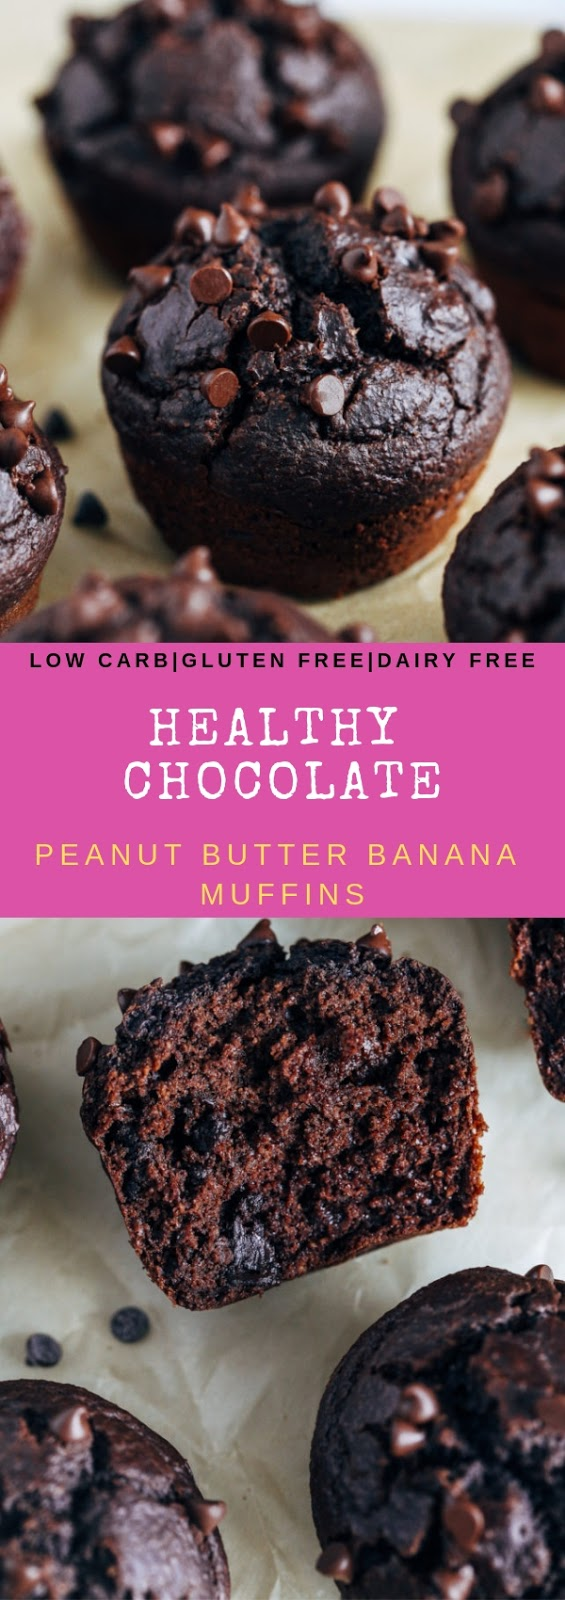 HEALTHY CHOCOLATE PEANUT BUTTER BANANA MUFFINS #dessert lowcarb #glutenfree #dairyfree #healthy #chocolate #peanut #butter #banana #muffin